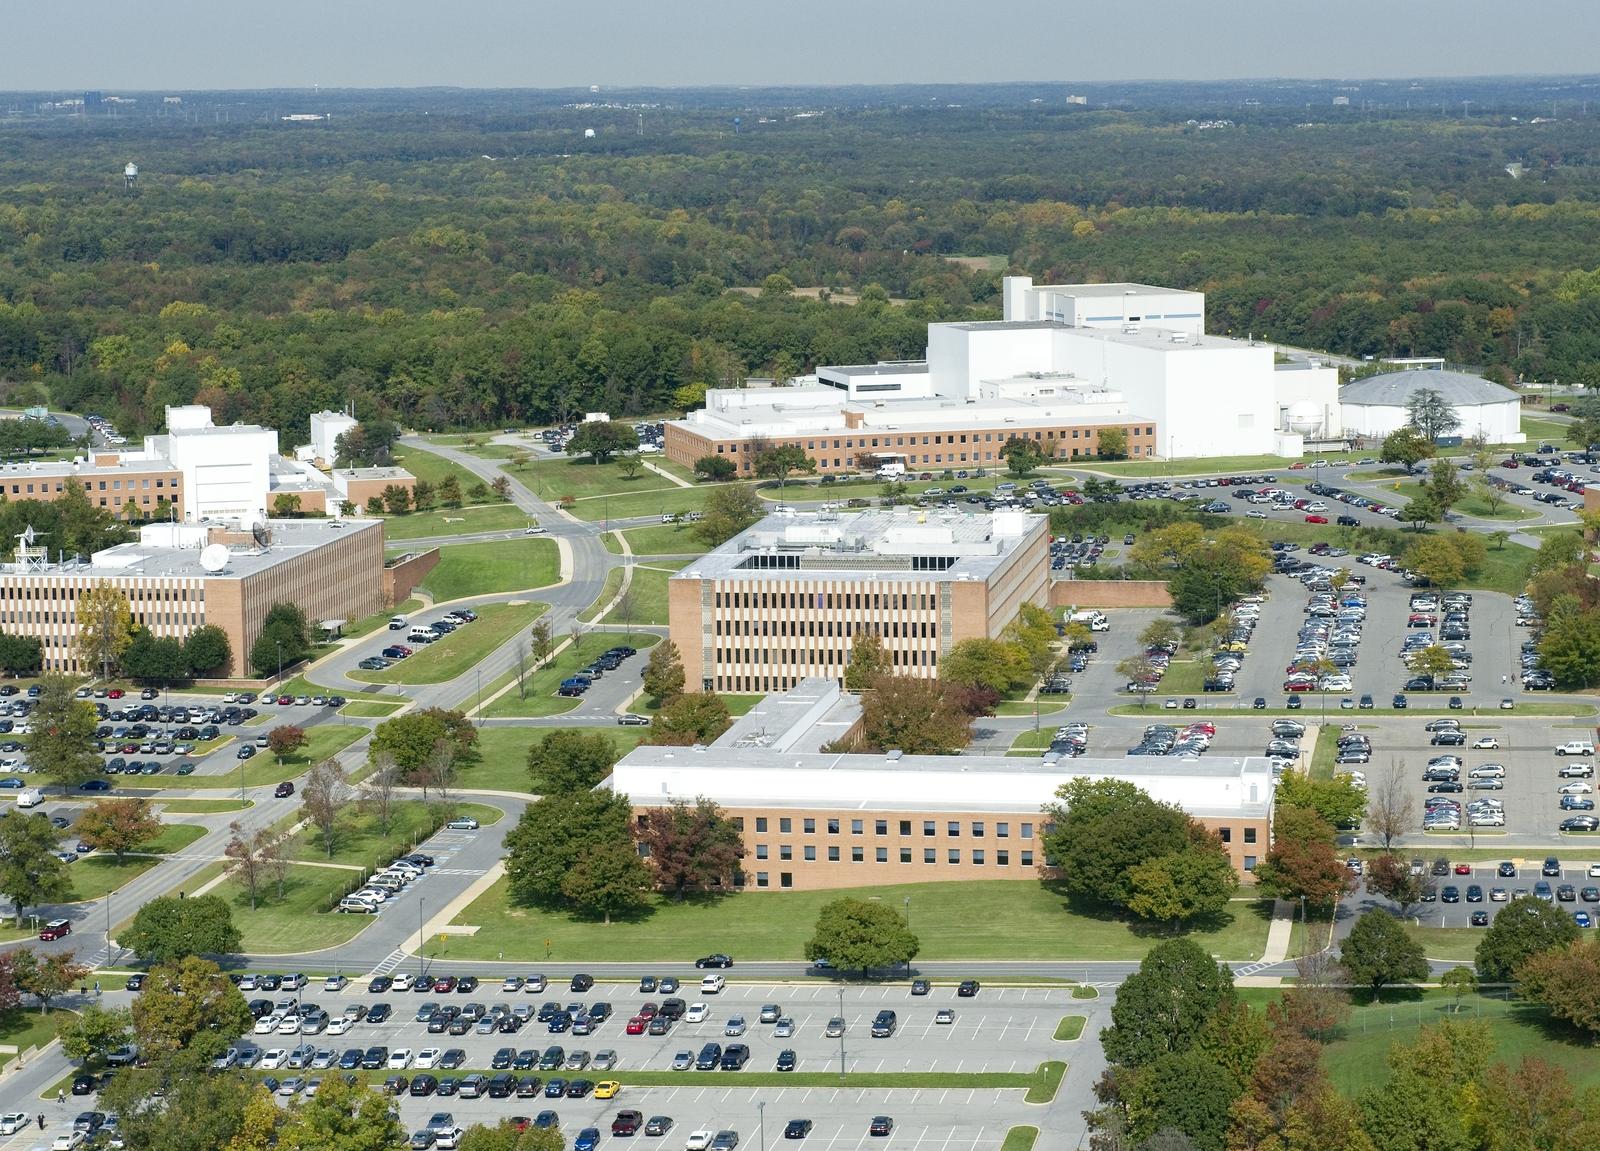 https://picryl com/media/oct-2011-aerial-photographs-of